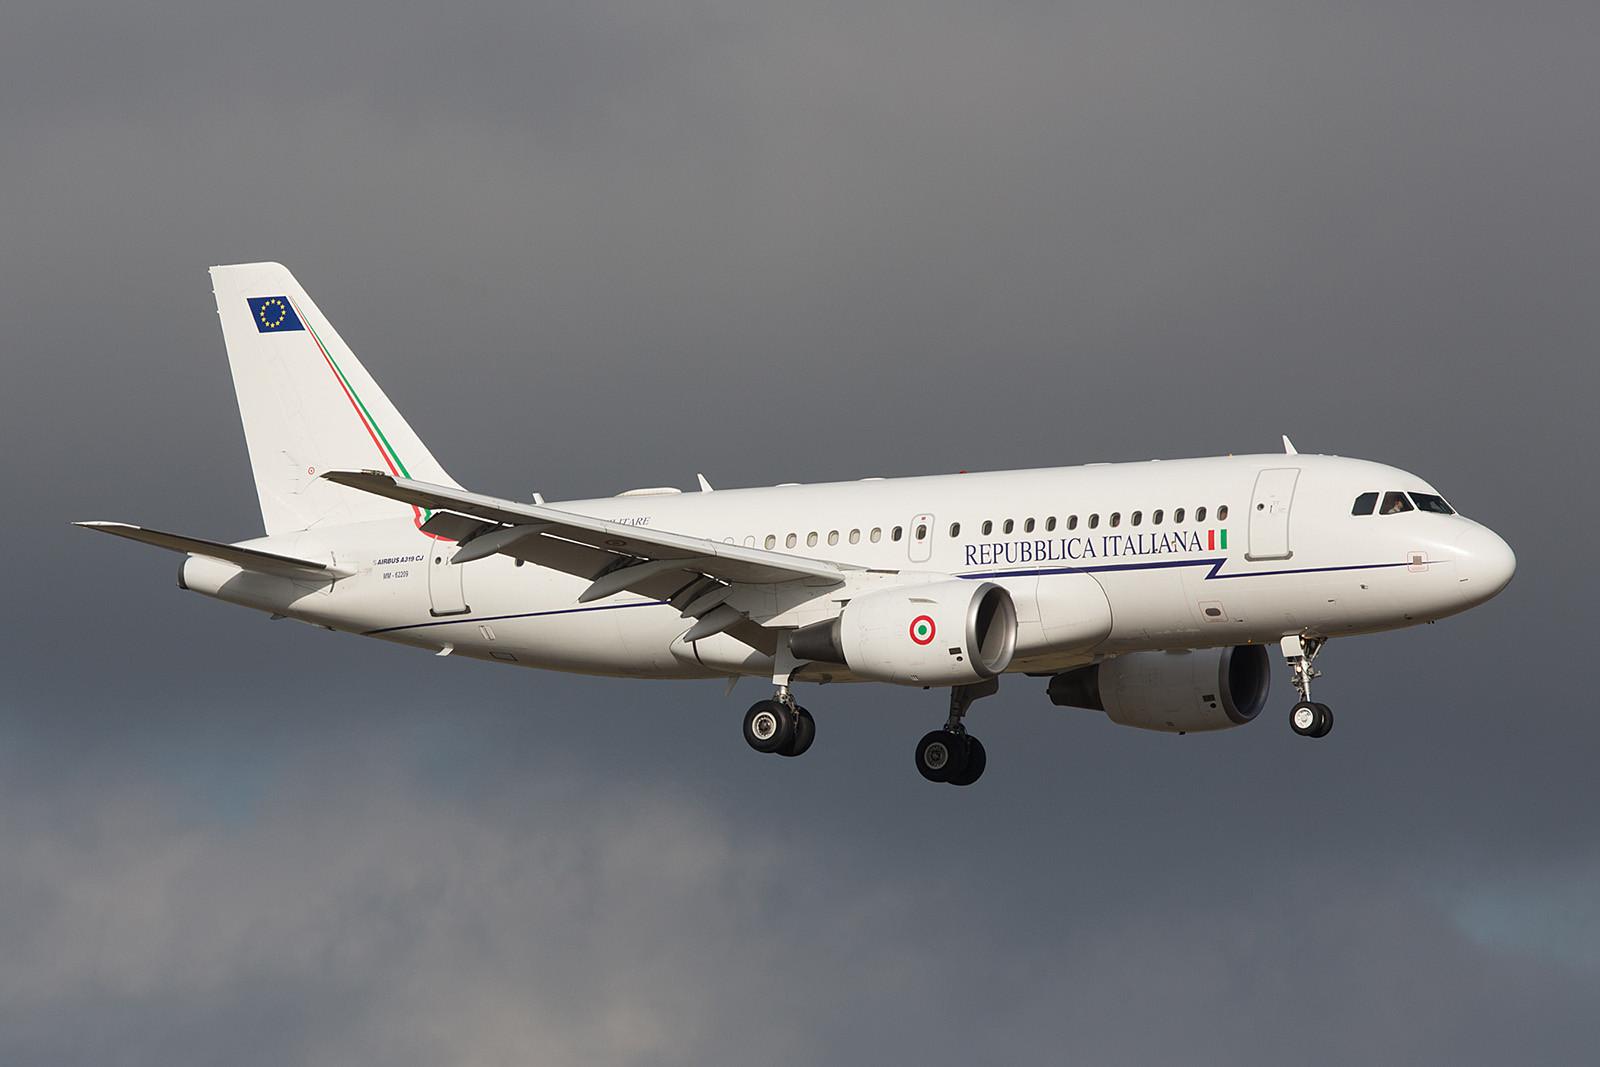 MM62209; Airbus A319-115X (CJ) der Aeronautica Militare